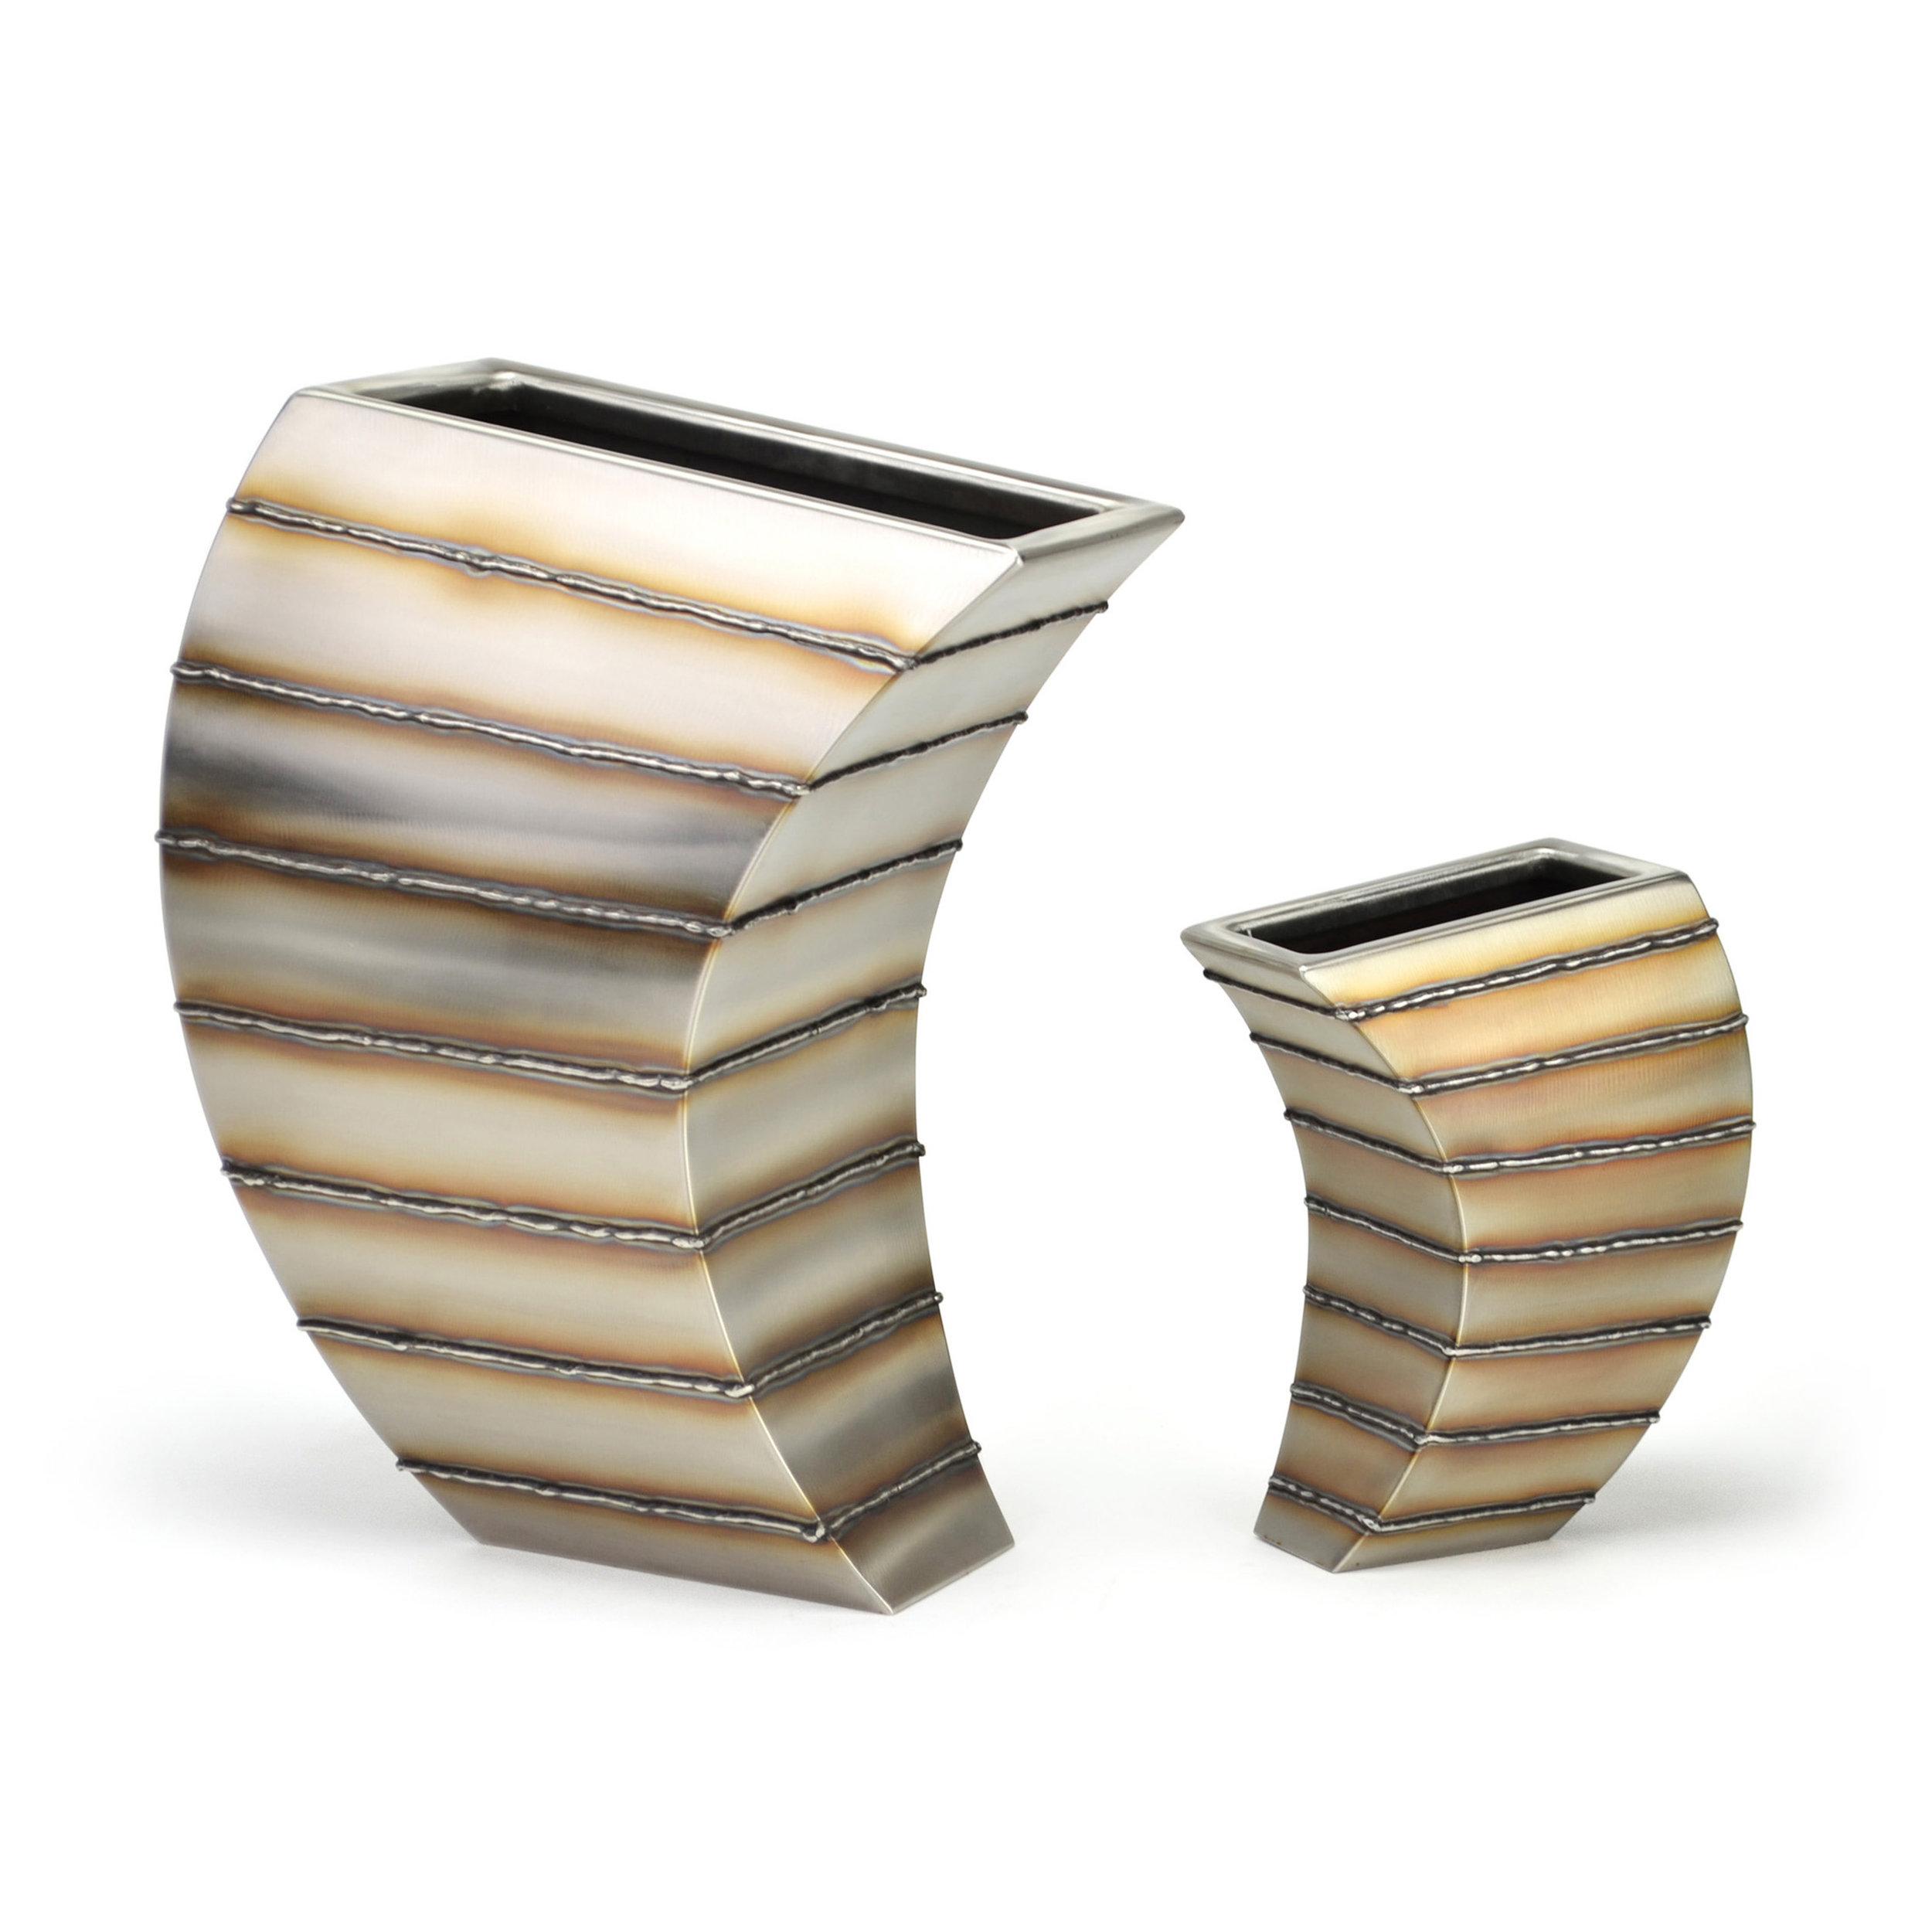 "Sail - horizontal bead stripe , Small: 10"" x 7.5"", x 4"", Large: 17"" x 13"" x 7"", Stainless Steel"